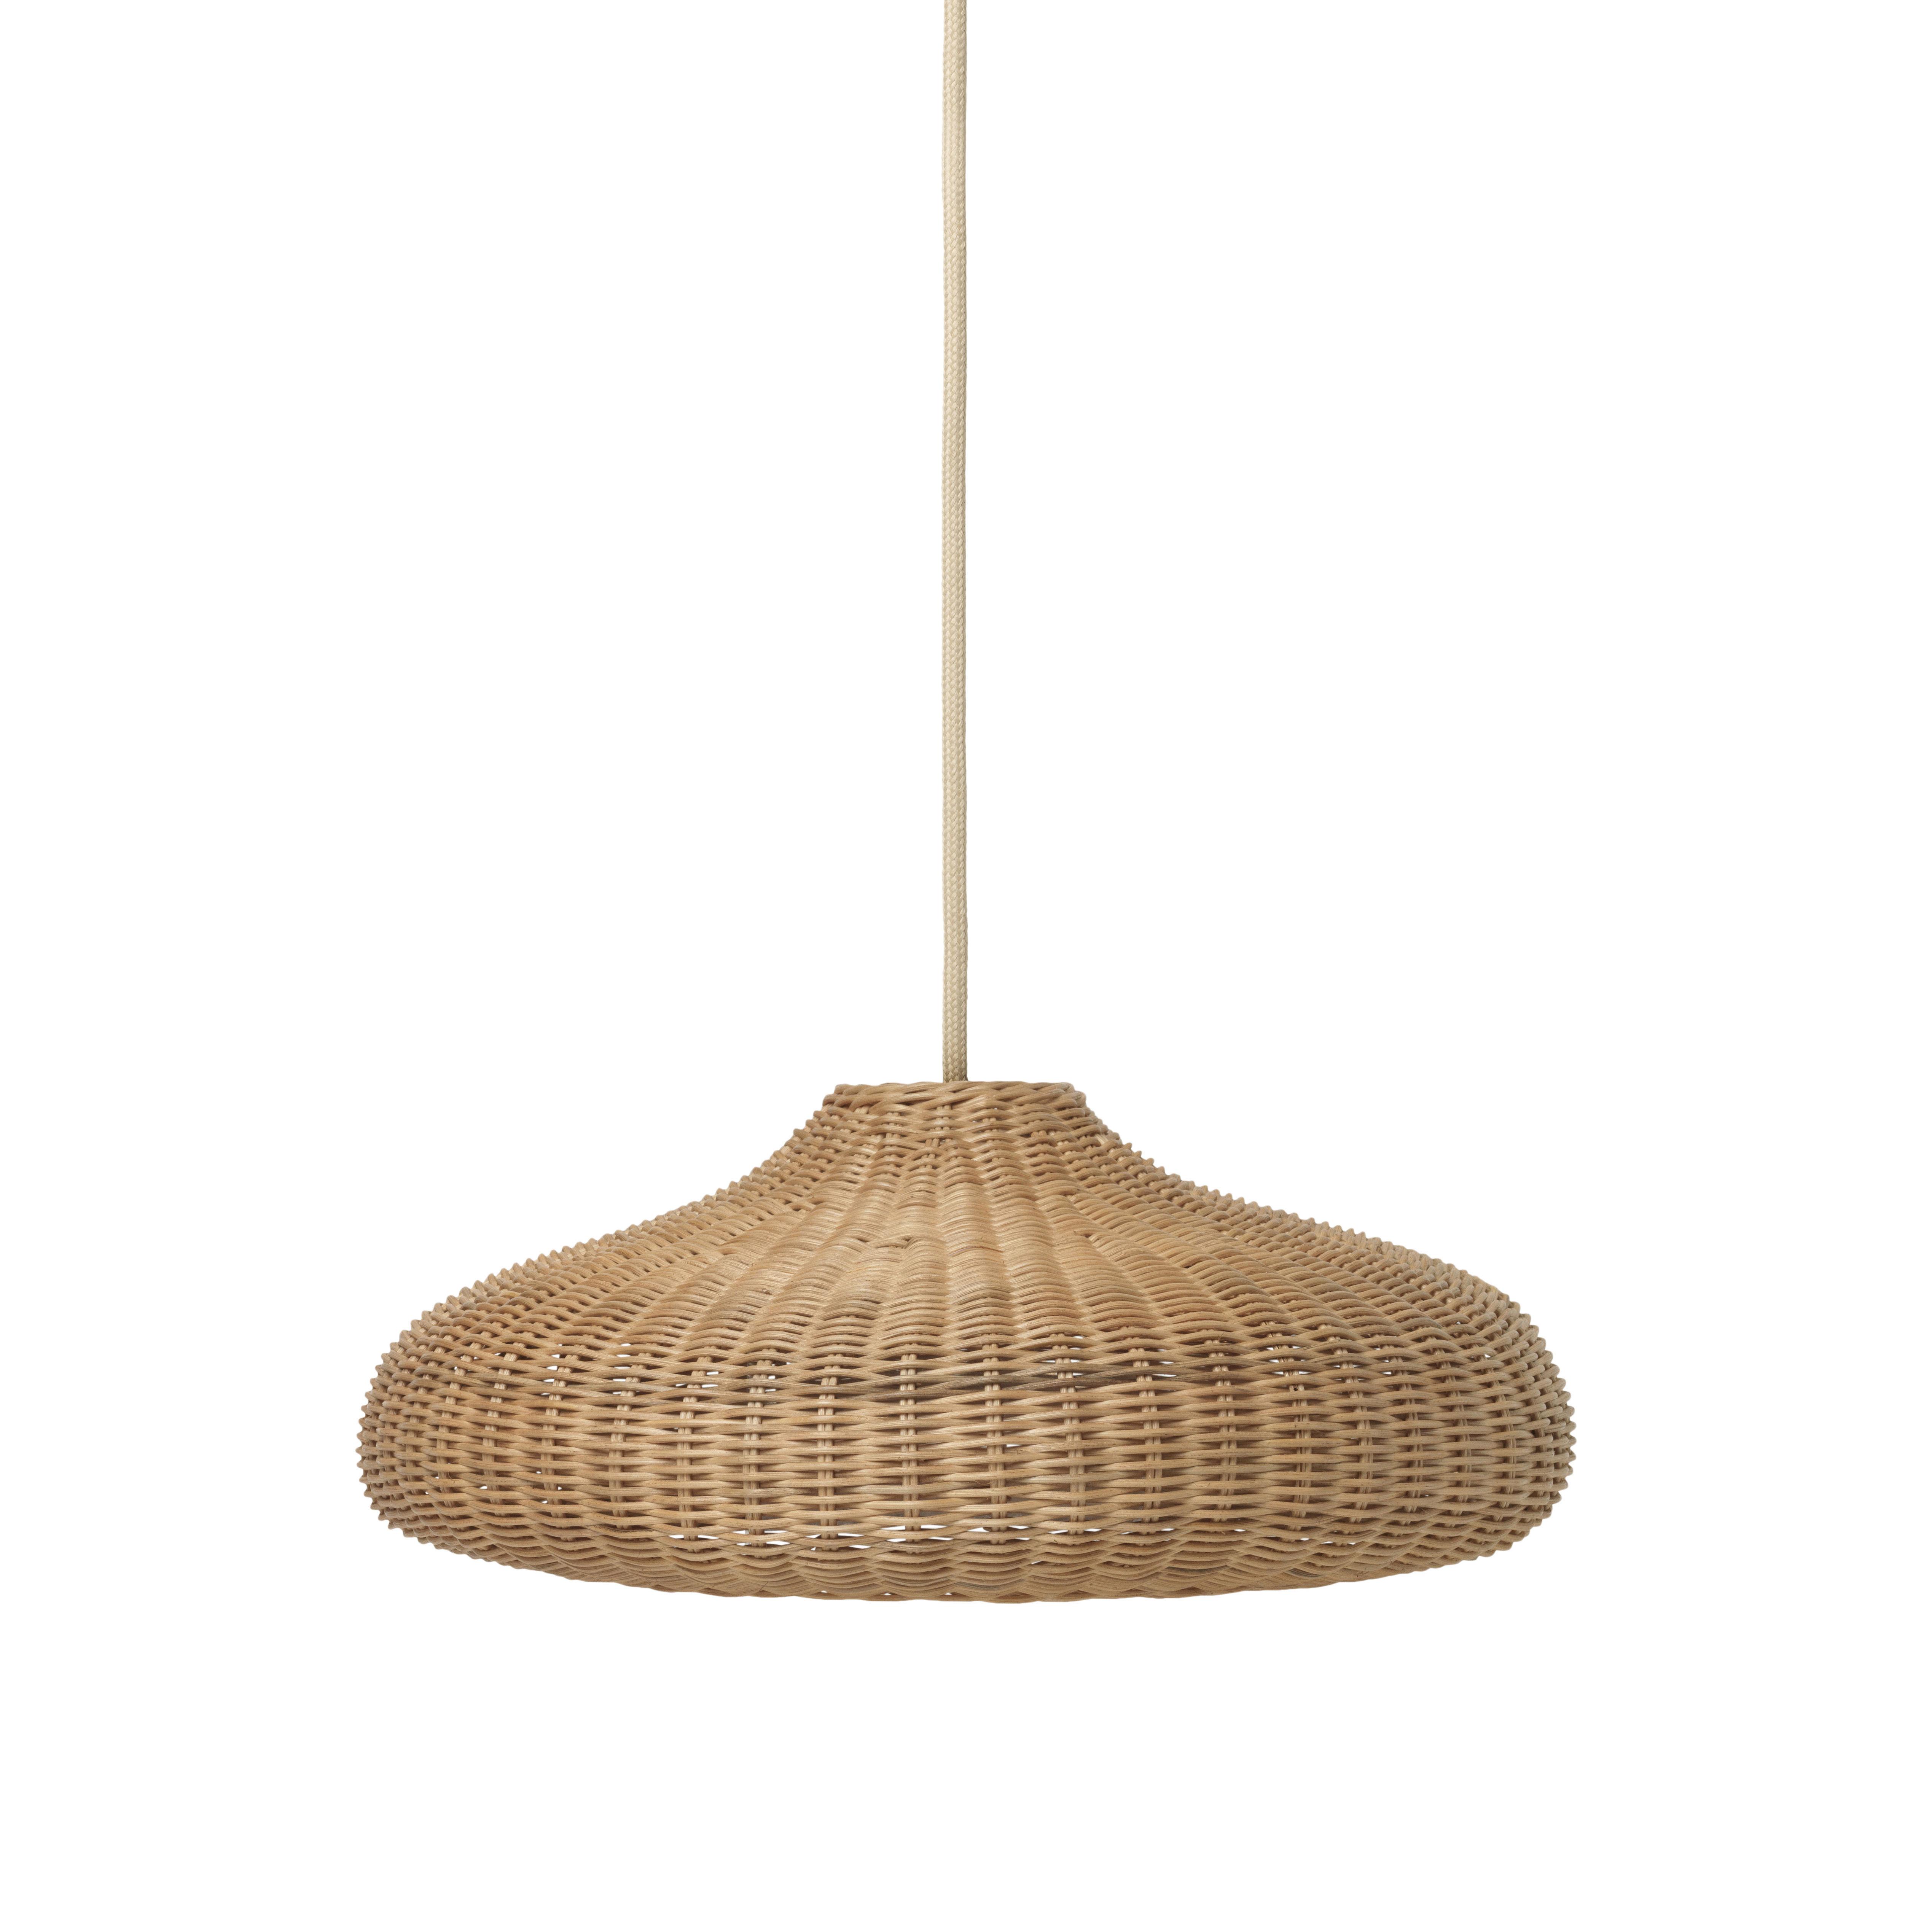 Luminaire - Suspensions - Abat-jour Braided / Rotin - Ferm Living - Naturel - Rotin